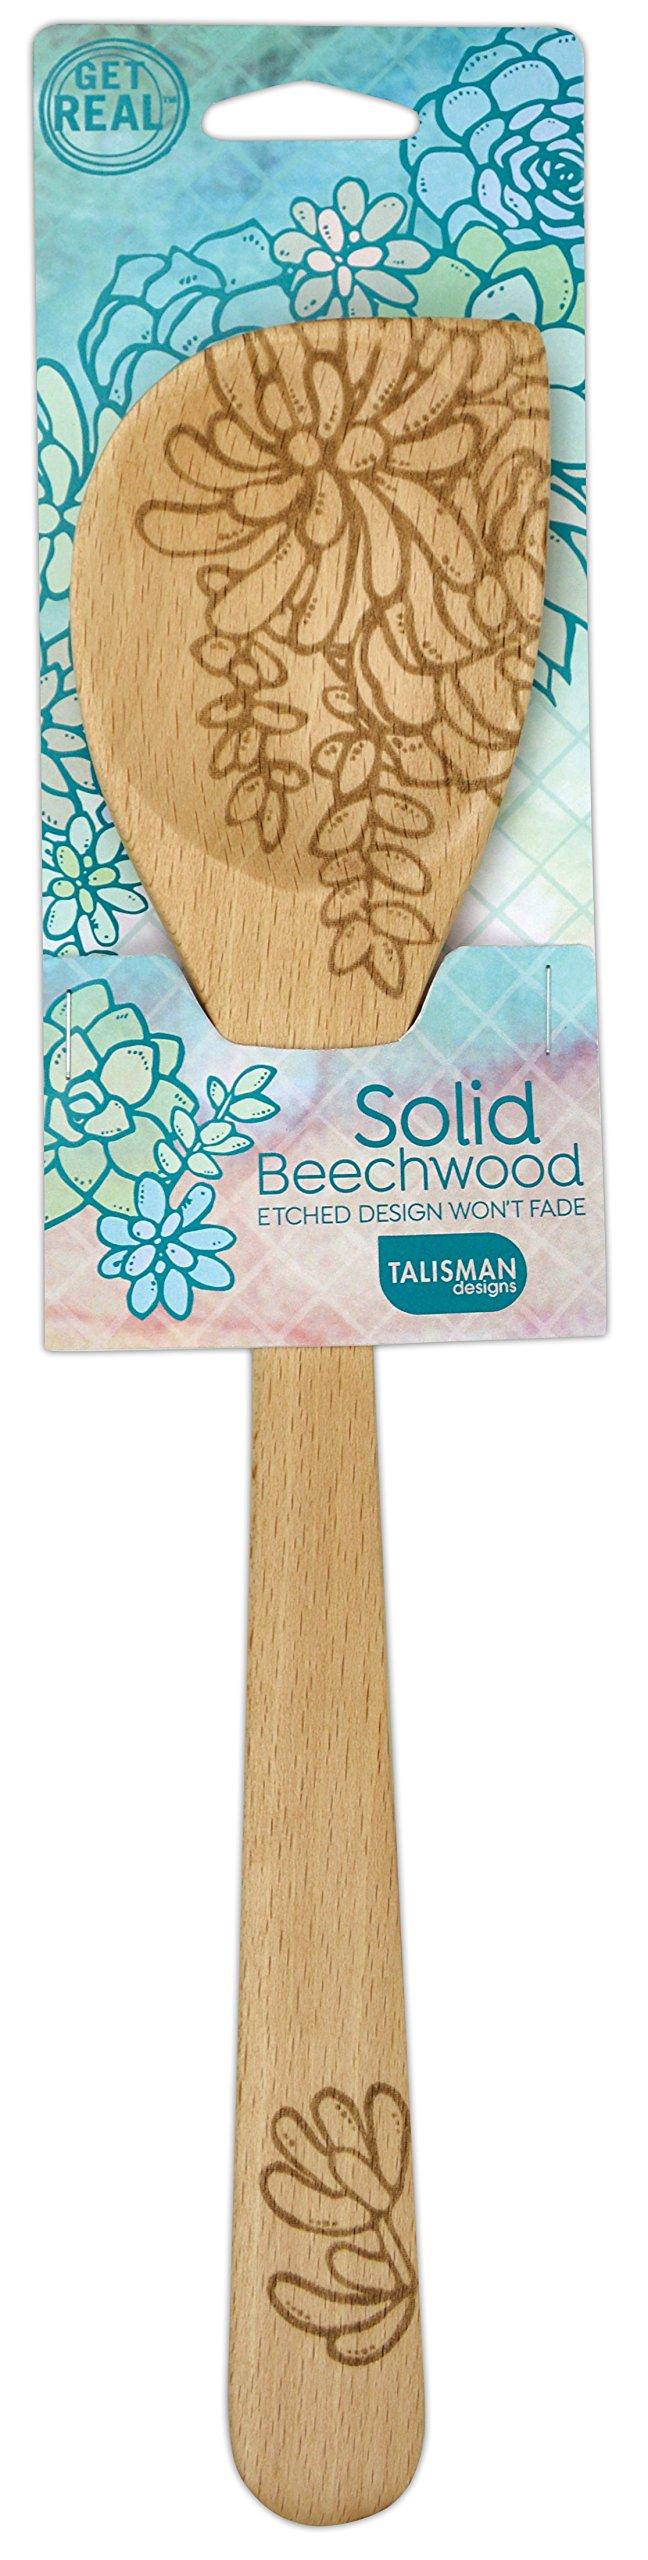 Talisman Designs 1923 Laser Etched Succulents Design Beechwood Corner Spoon